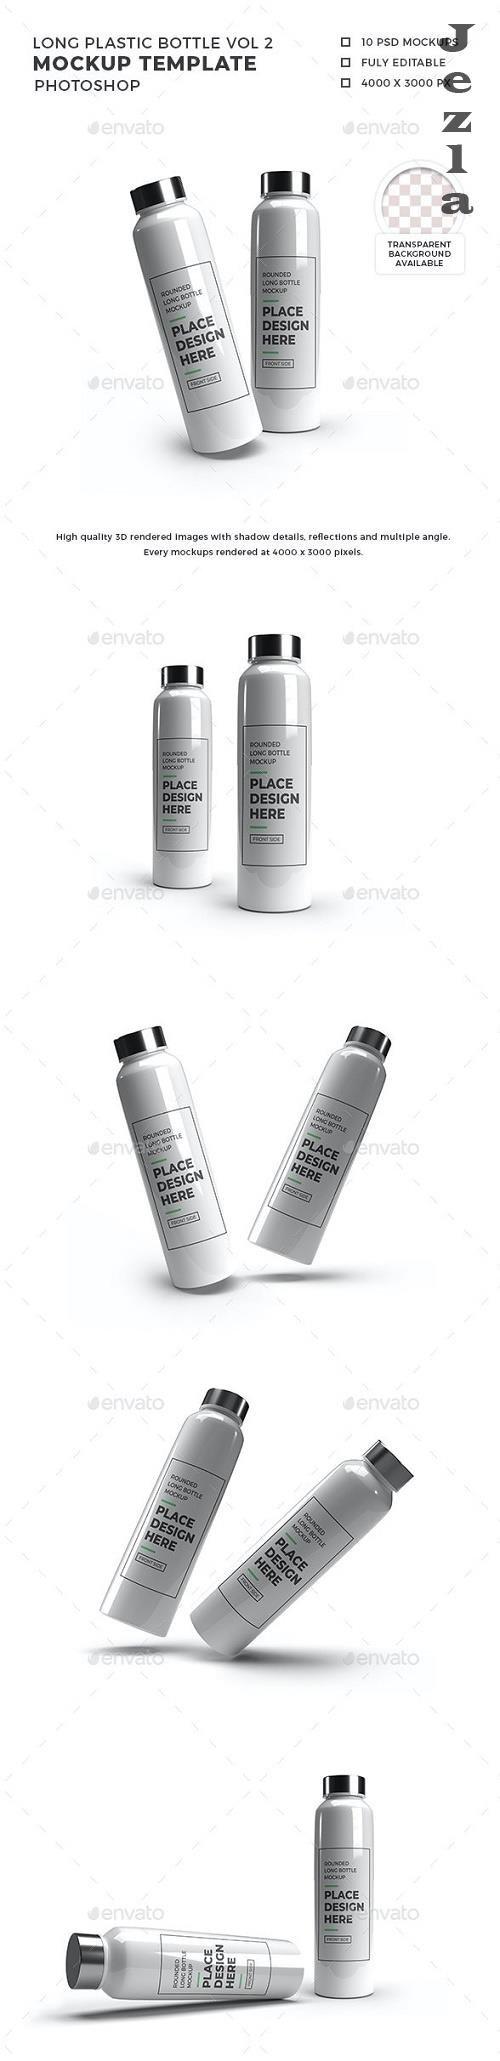 Long Rounded Plastic Bottle Mockup Vol 2 - 32564147